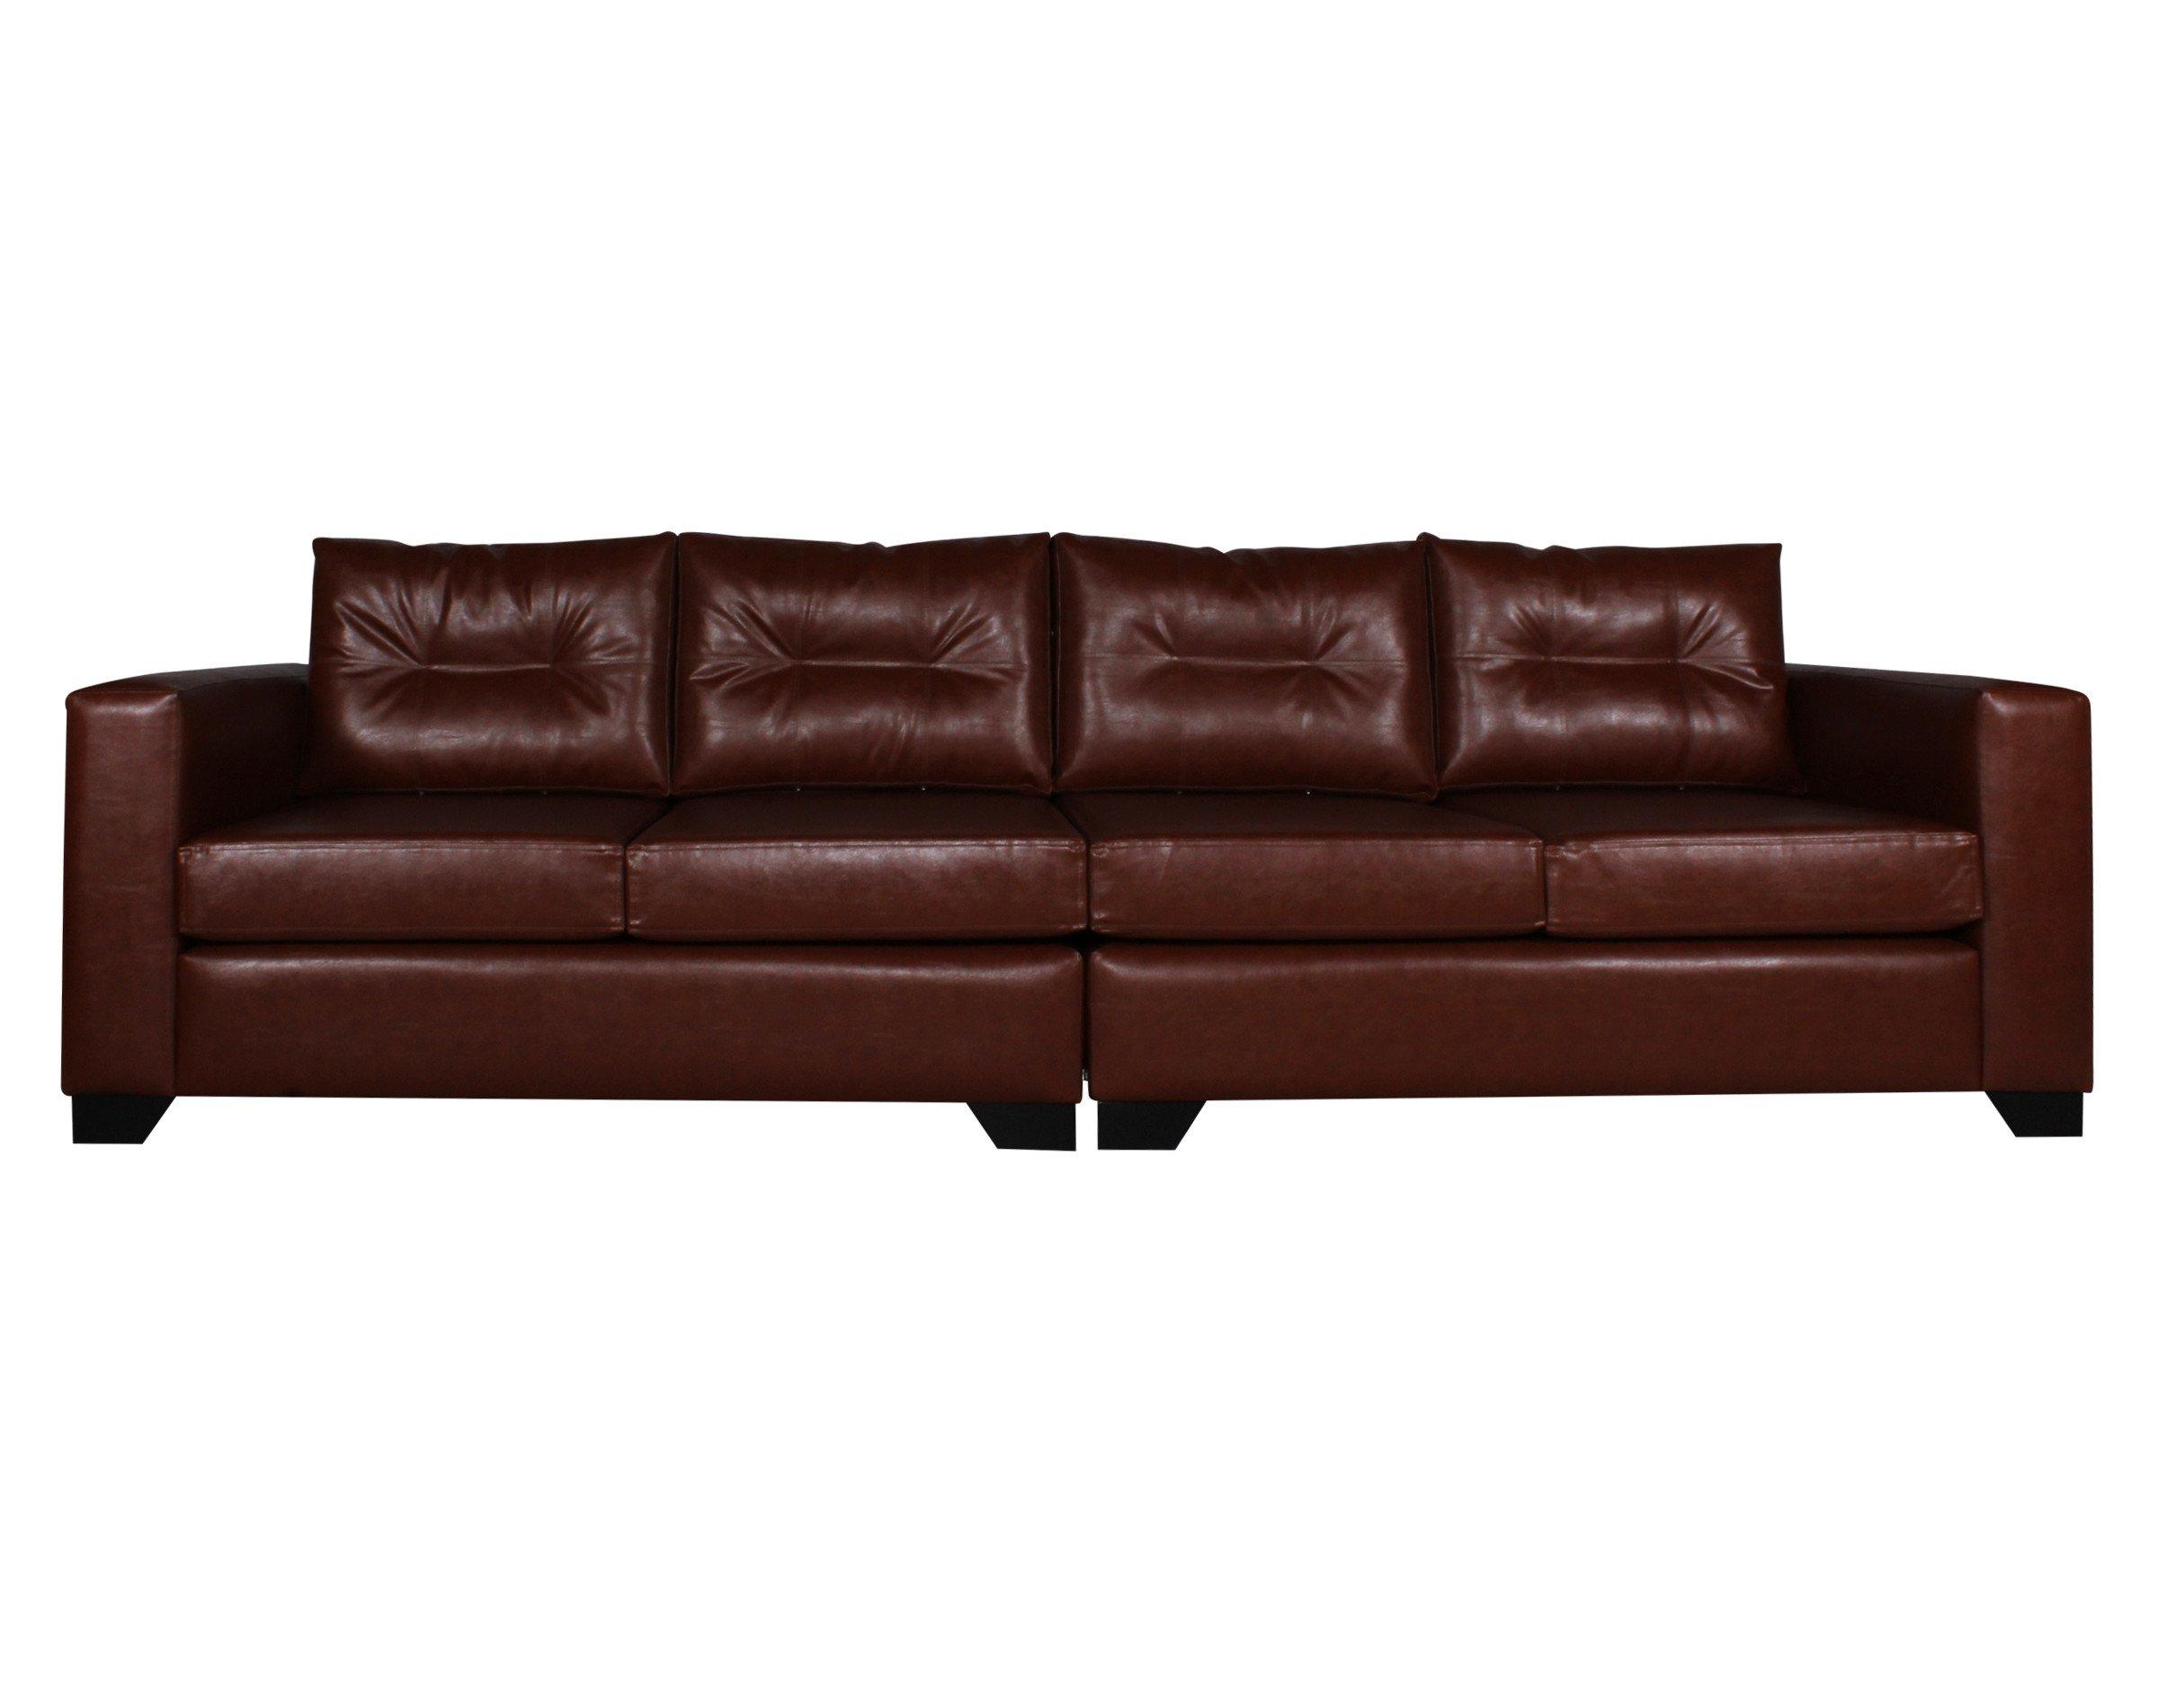 Sofa 4 Cuerpos Pu Clean Habano Frente